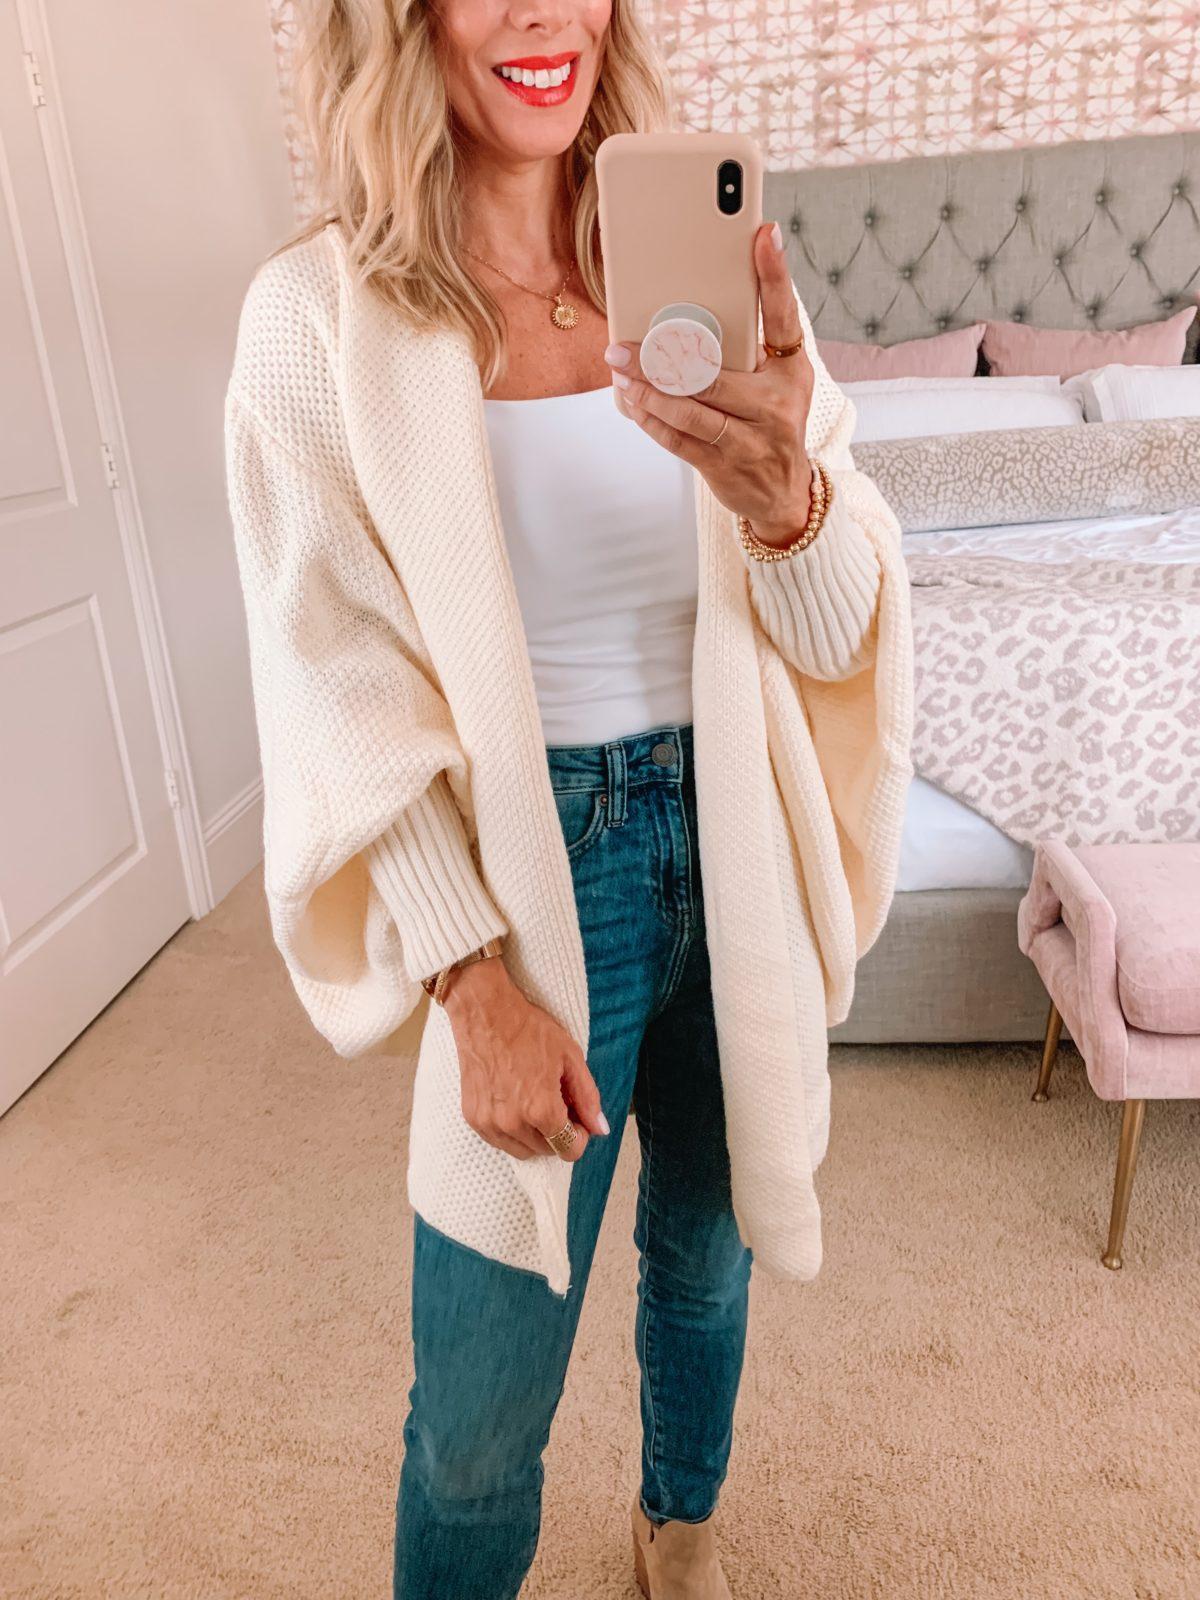 Amazon Fashion Faves, Bodysuit, Jeans, Cardigan, Booties